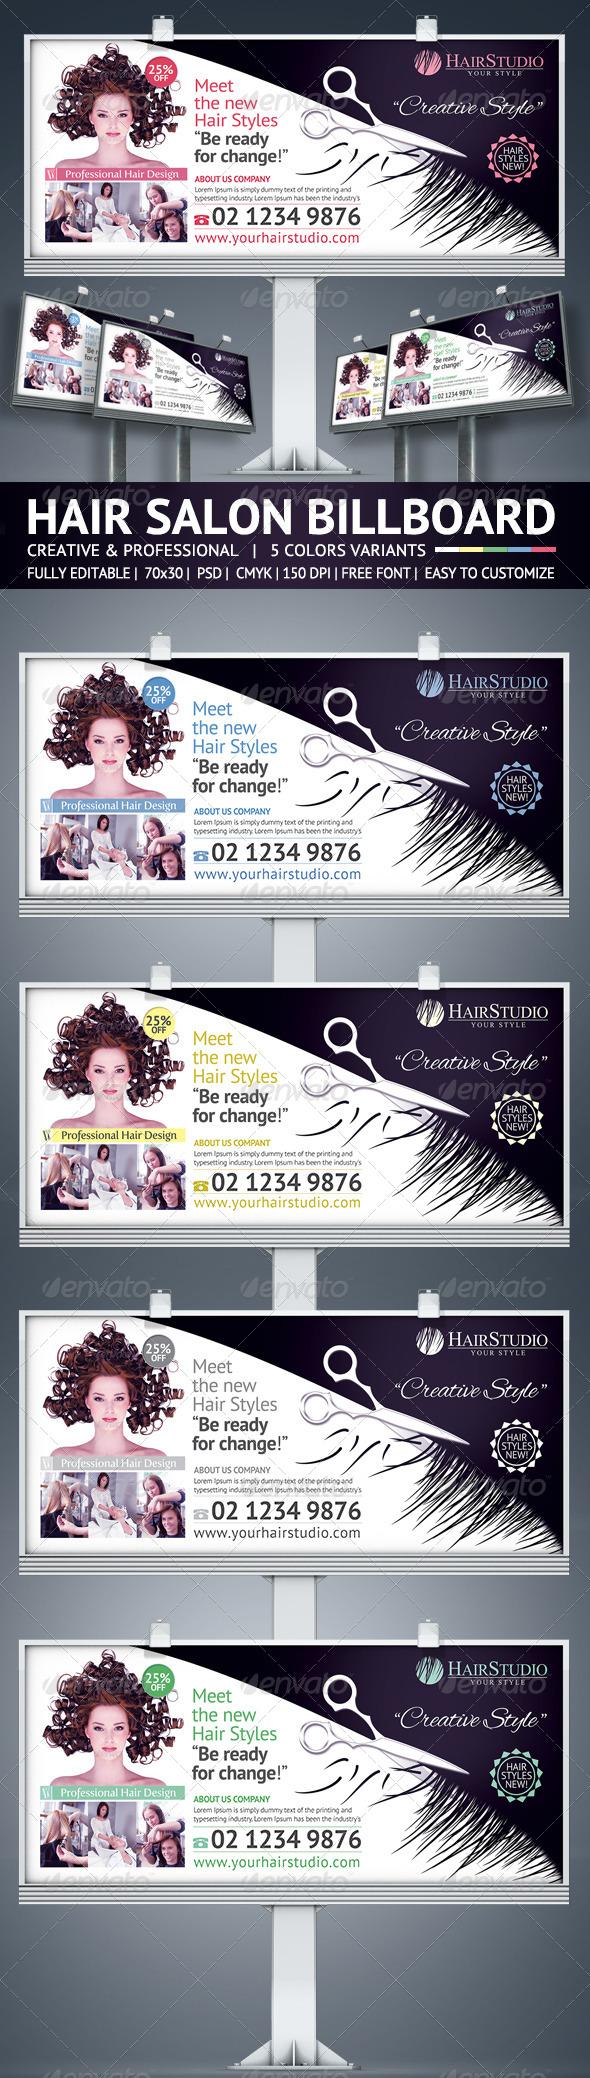 Hair Salon Billboard - Signage Print Templates